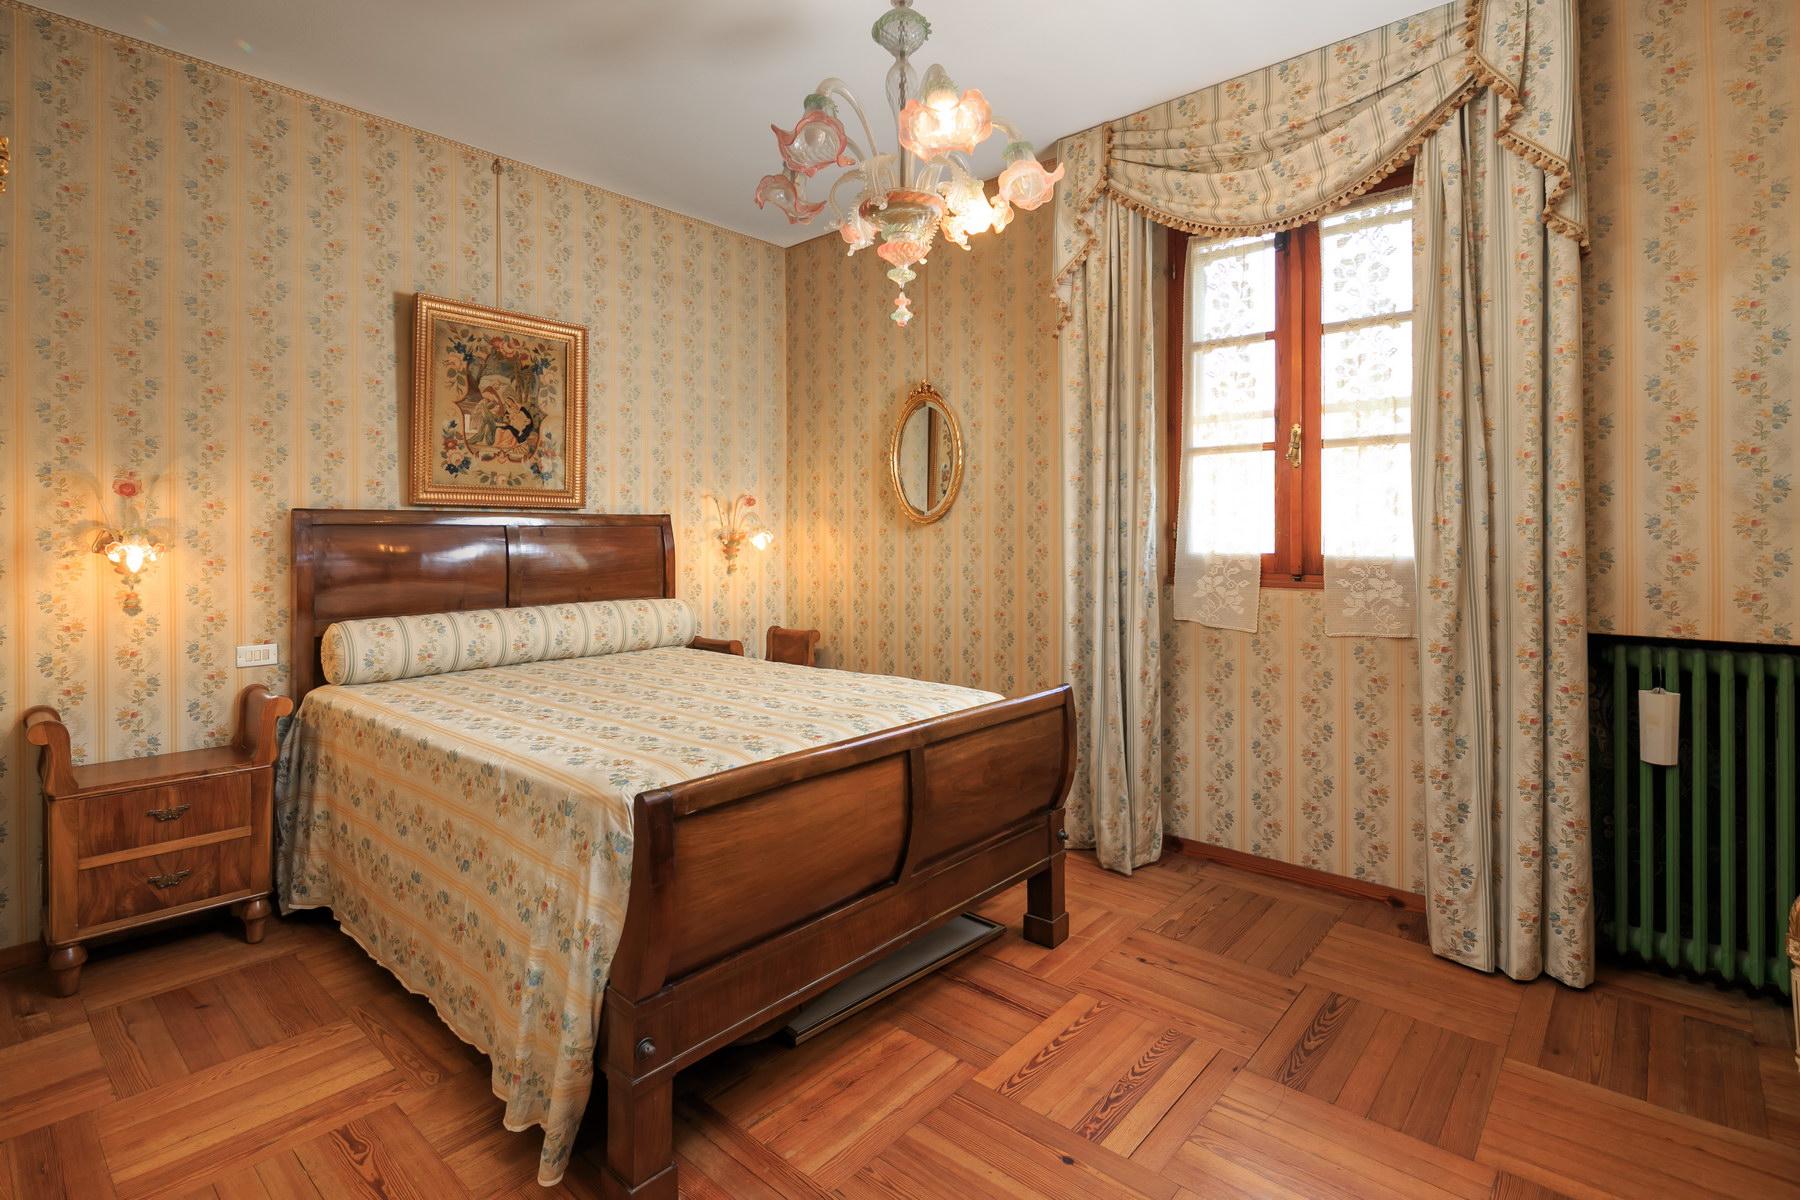 Villa in Vendita a Lerici: 5 locali, 620 mq - Foto 14